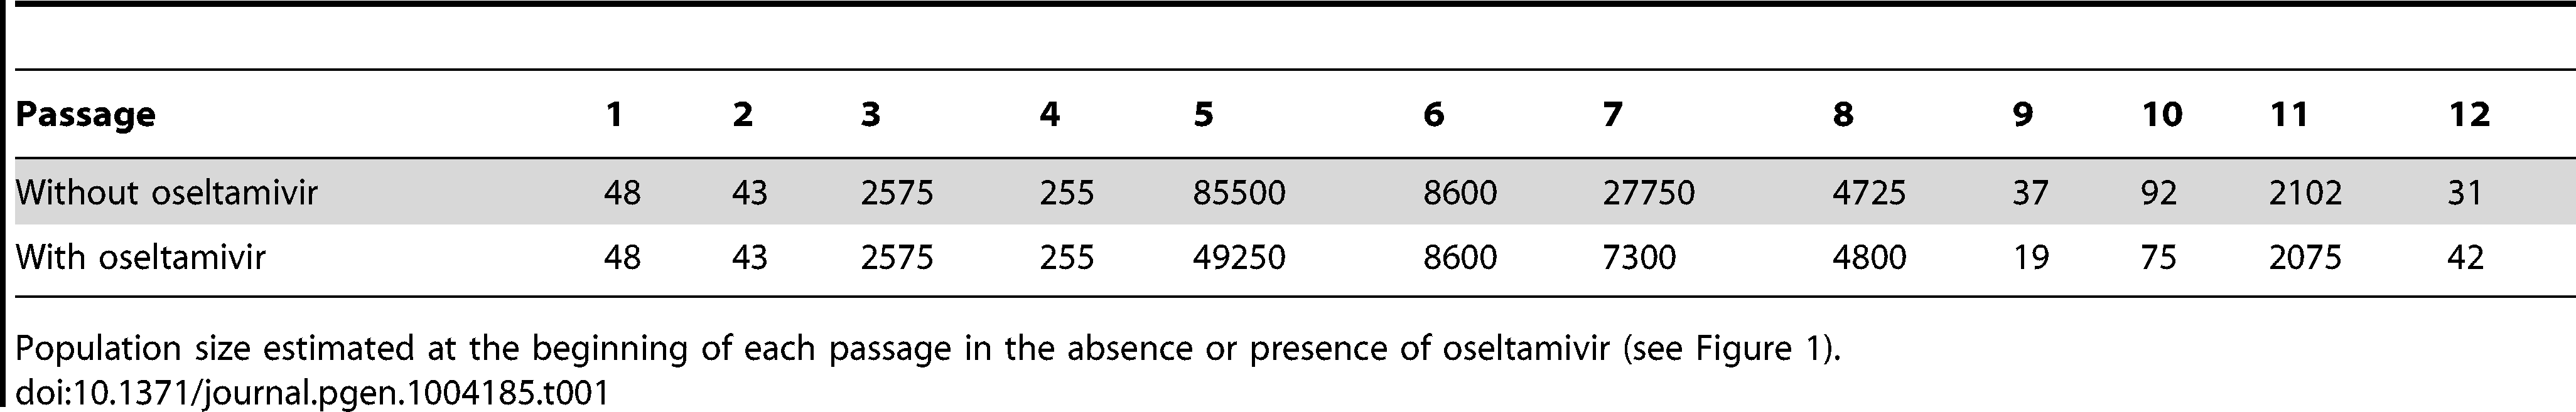 Bottleneck sizes at each passage.